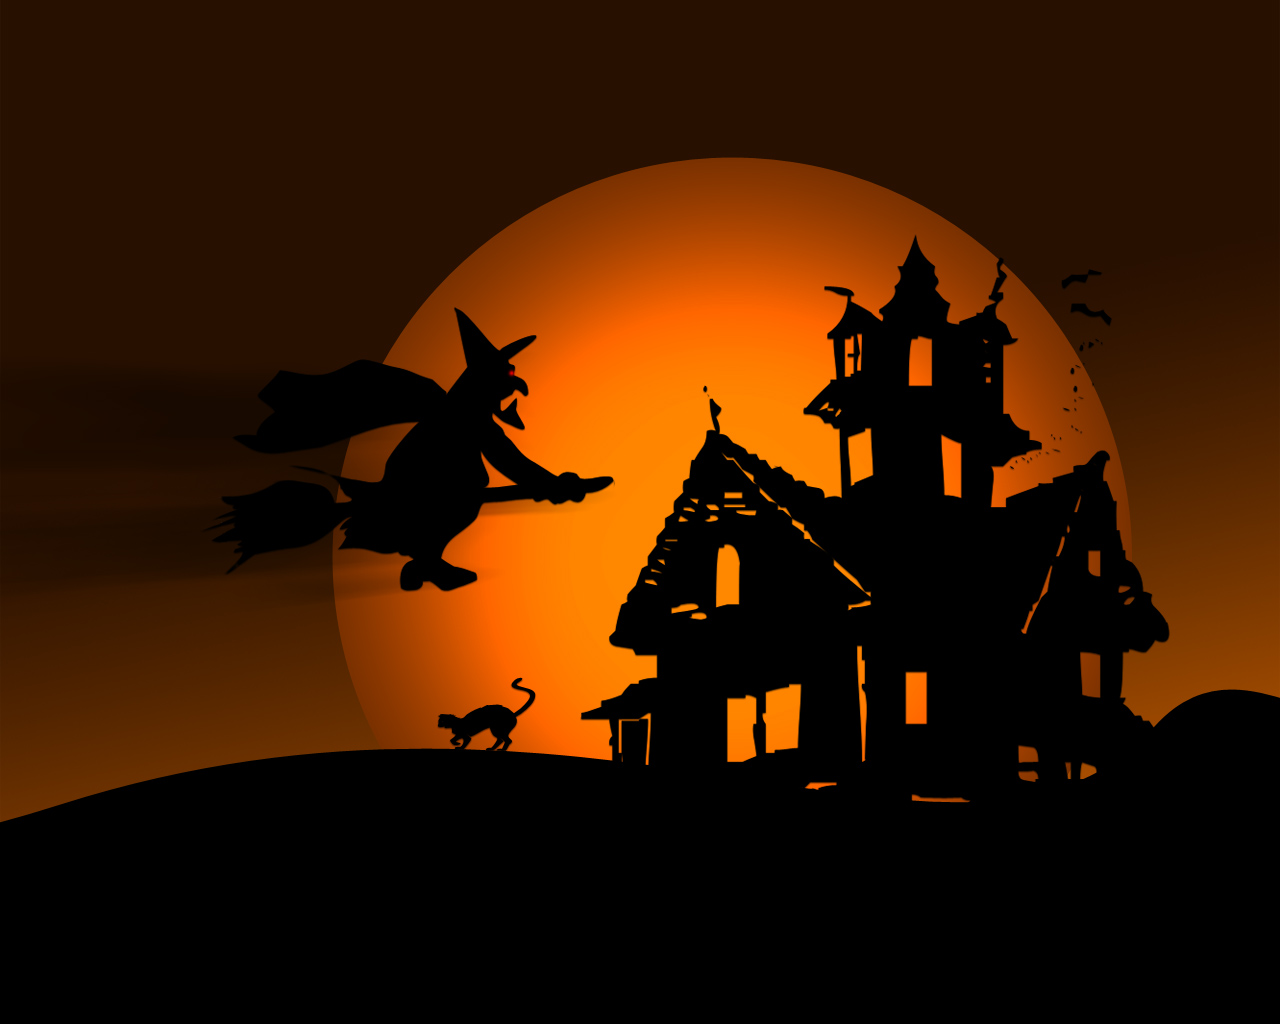 http://1.bp.blogspot.com/-cu7gHHHo3CU/Tq4AS1m4ToI/AAAAAAAAB9k/n-fDmY4sqUM/s1600/halloween-wallpaper-55.jpg